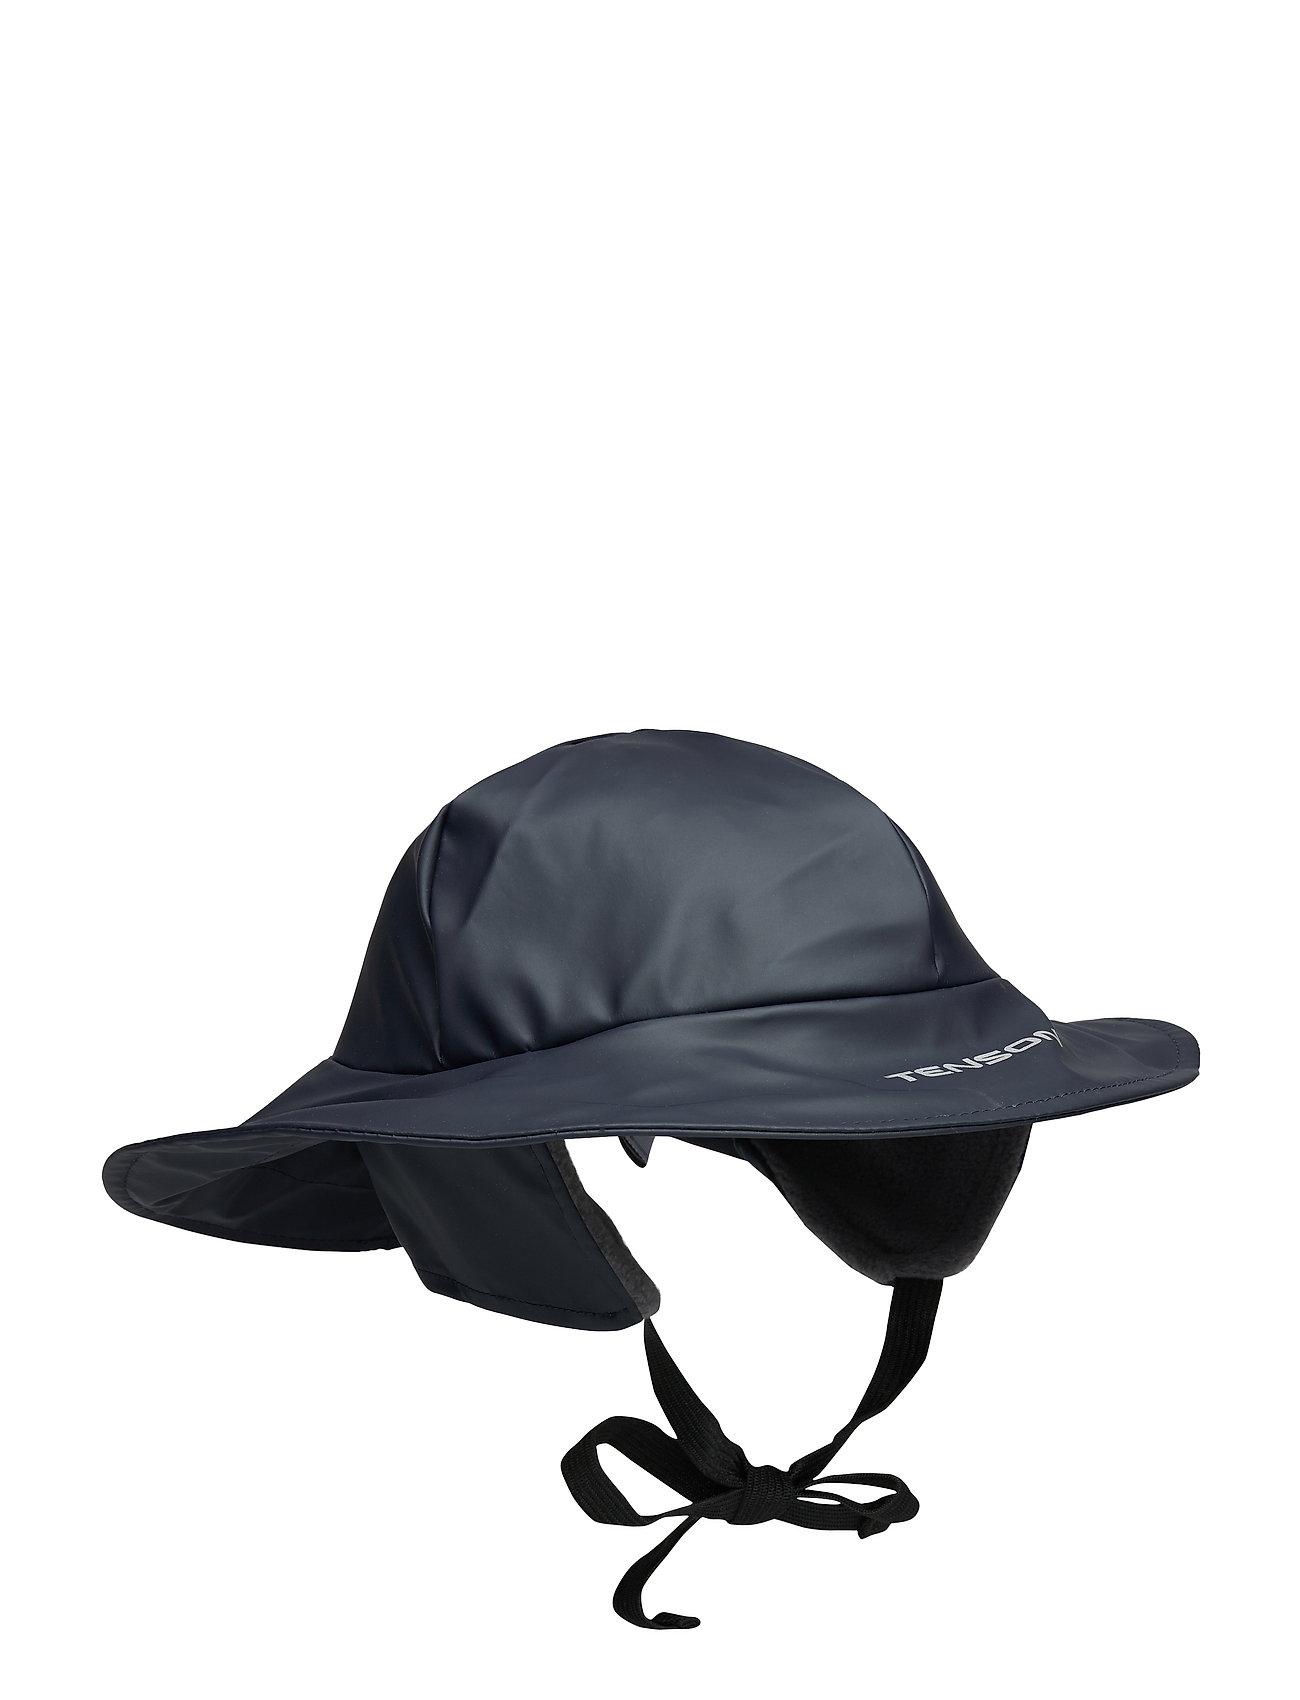 Image of Apollo Outerwear Rainwear Accessories Blå Tenson (3469875721)